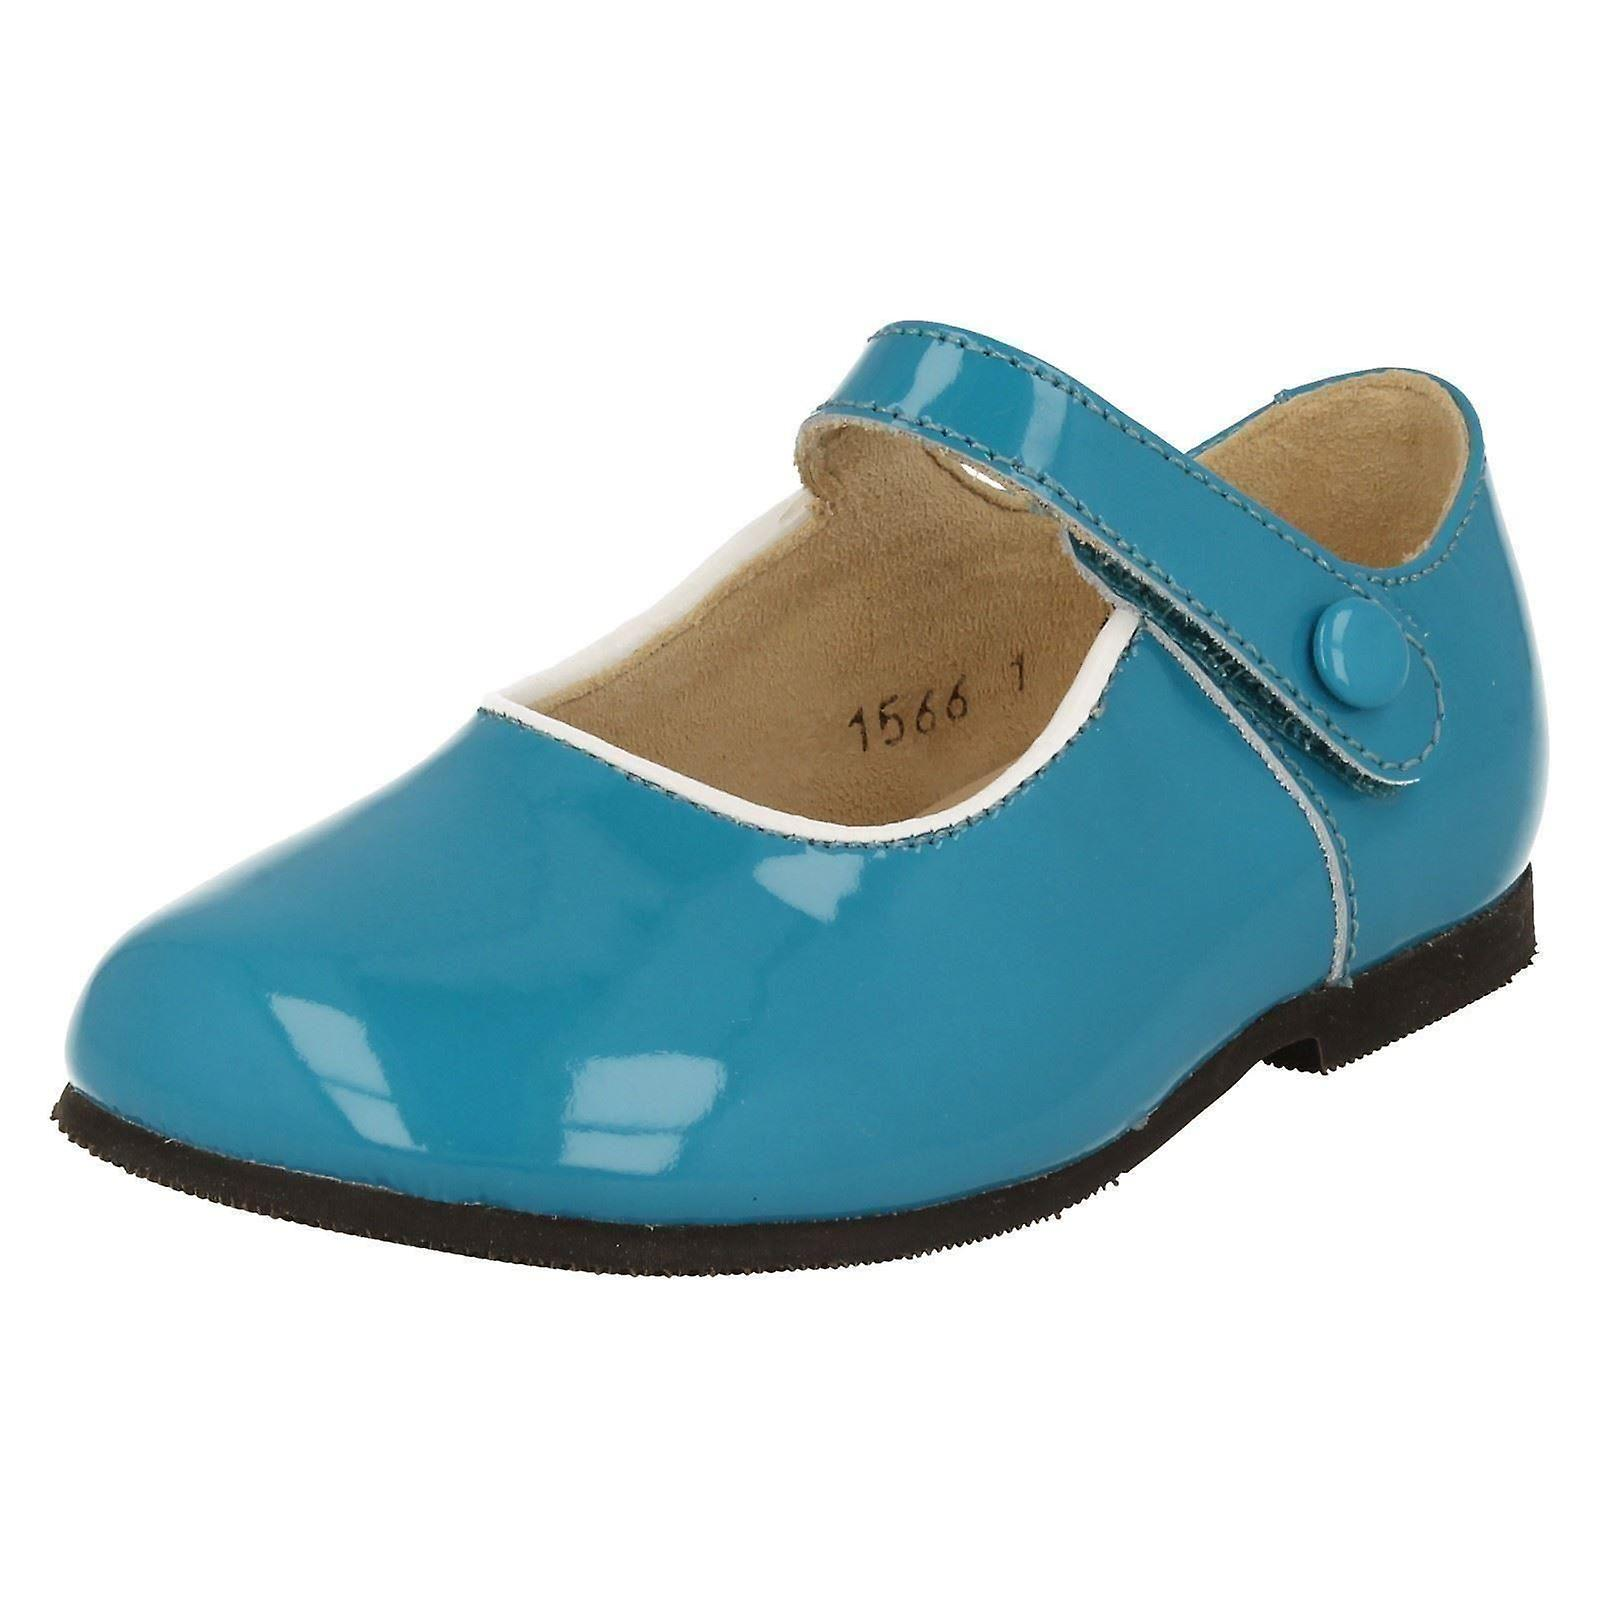 Infant Startrite Mary Jane flache Schuhe Caty V